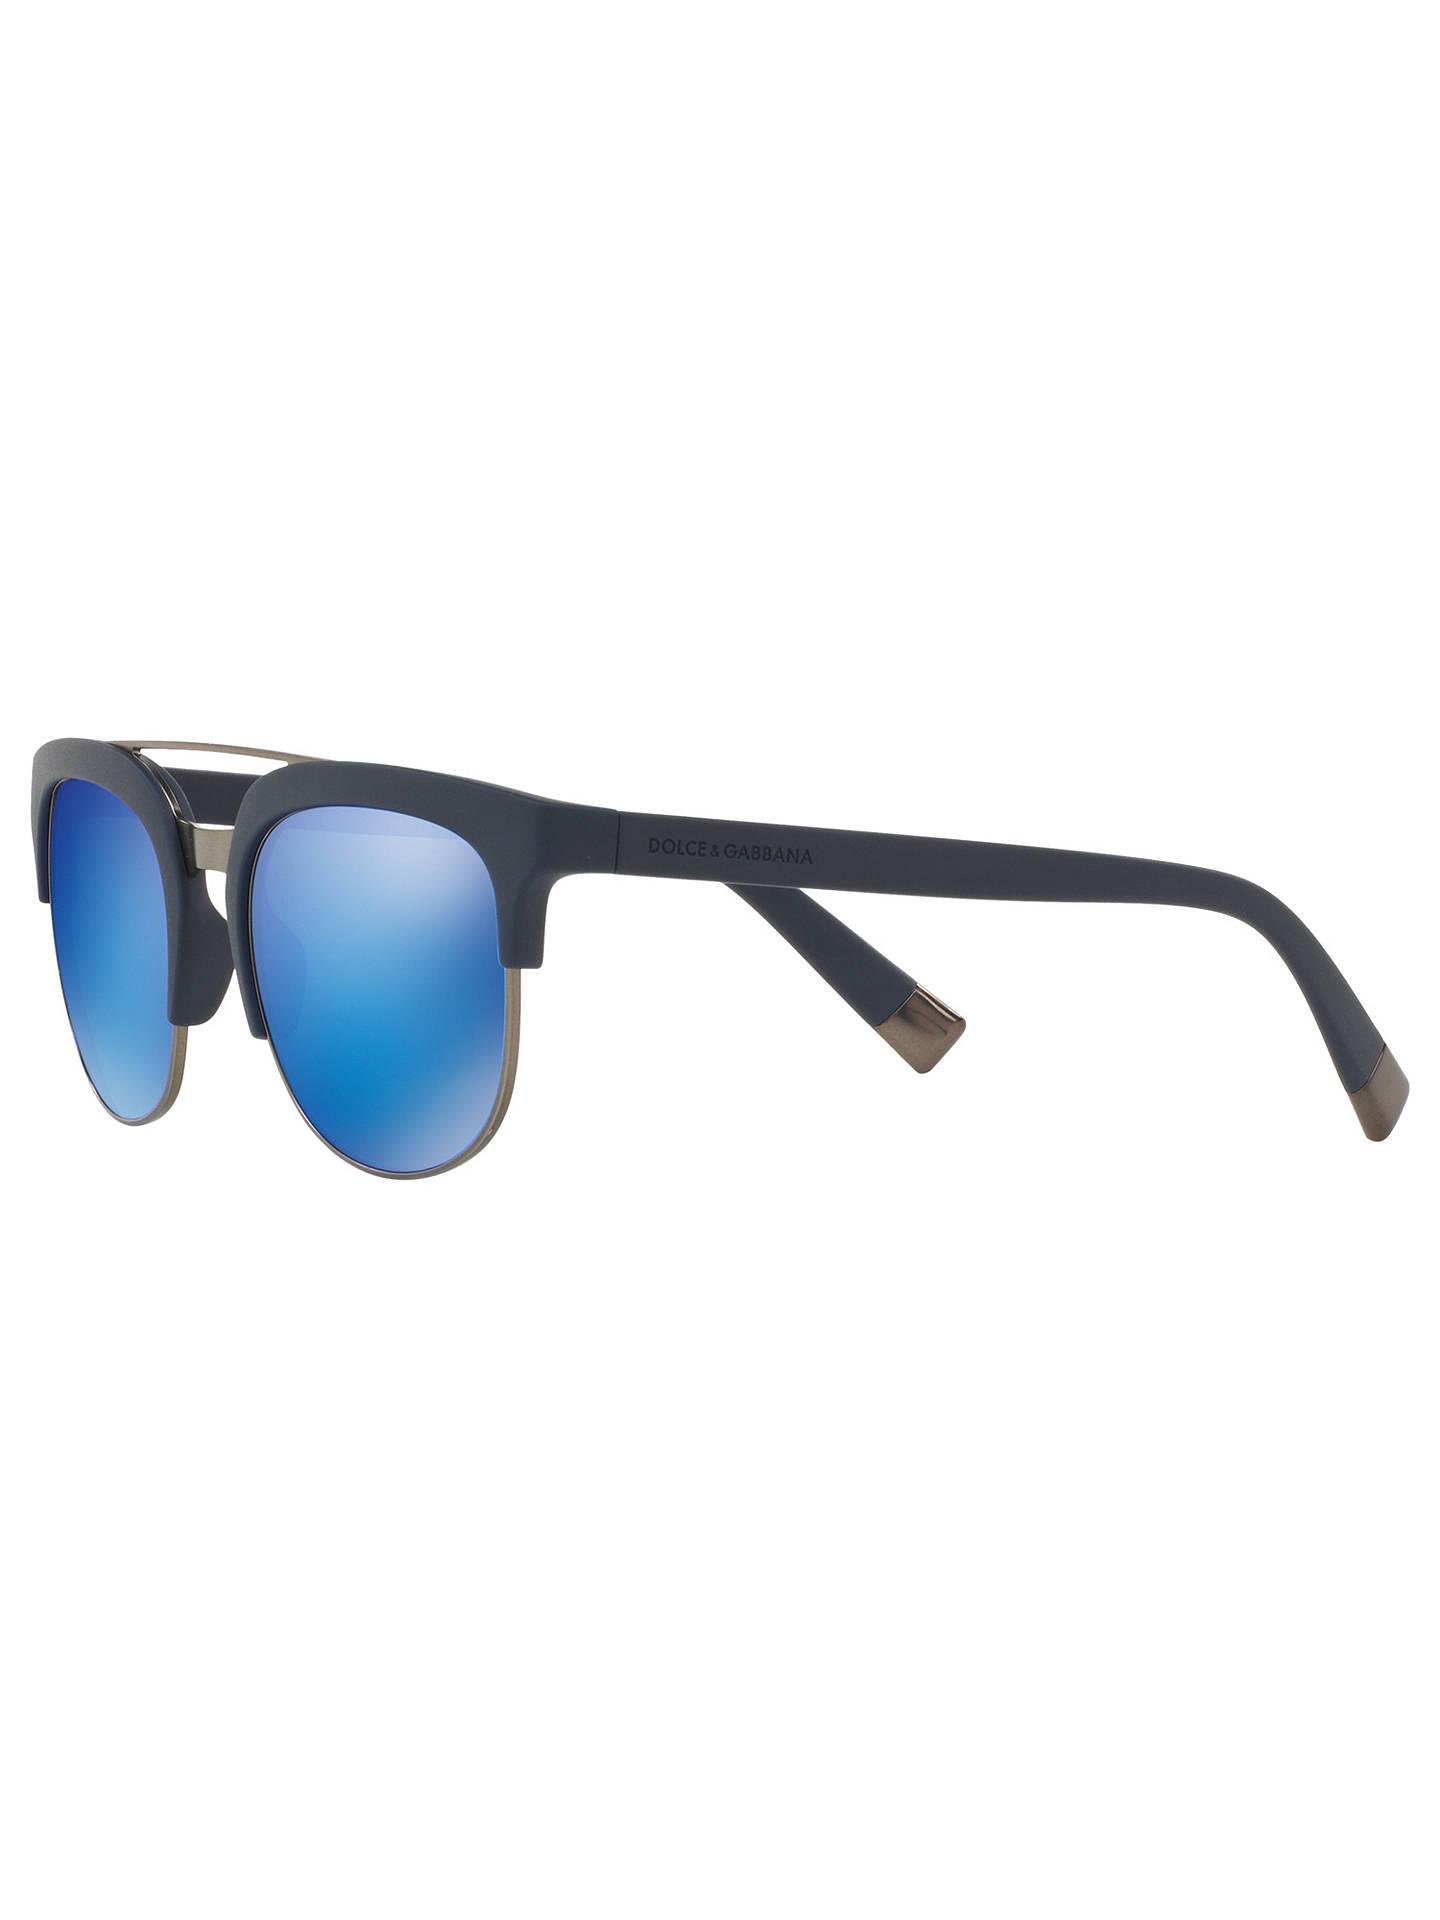 268860bd52 BuyDolce   Gabbana DG6103 Round Framed Sunglasses